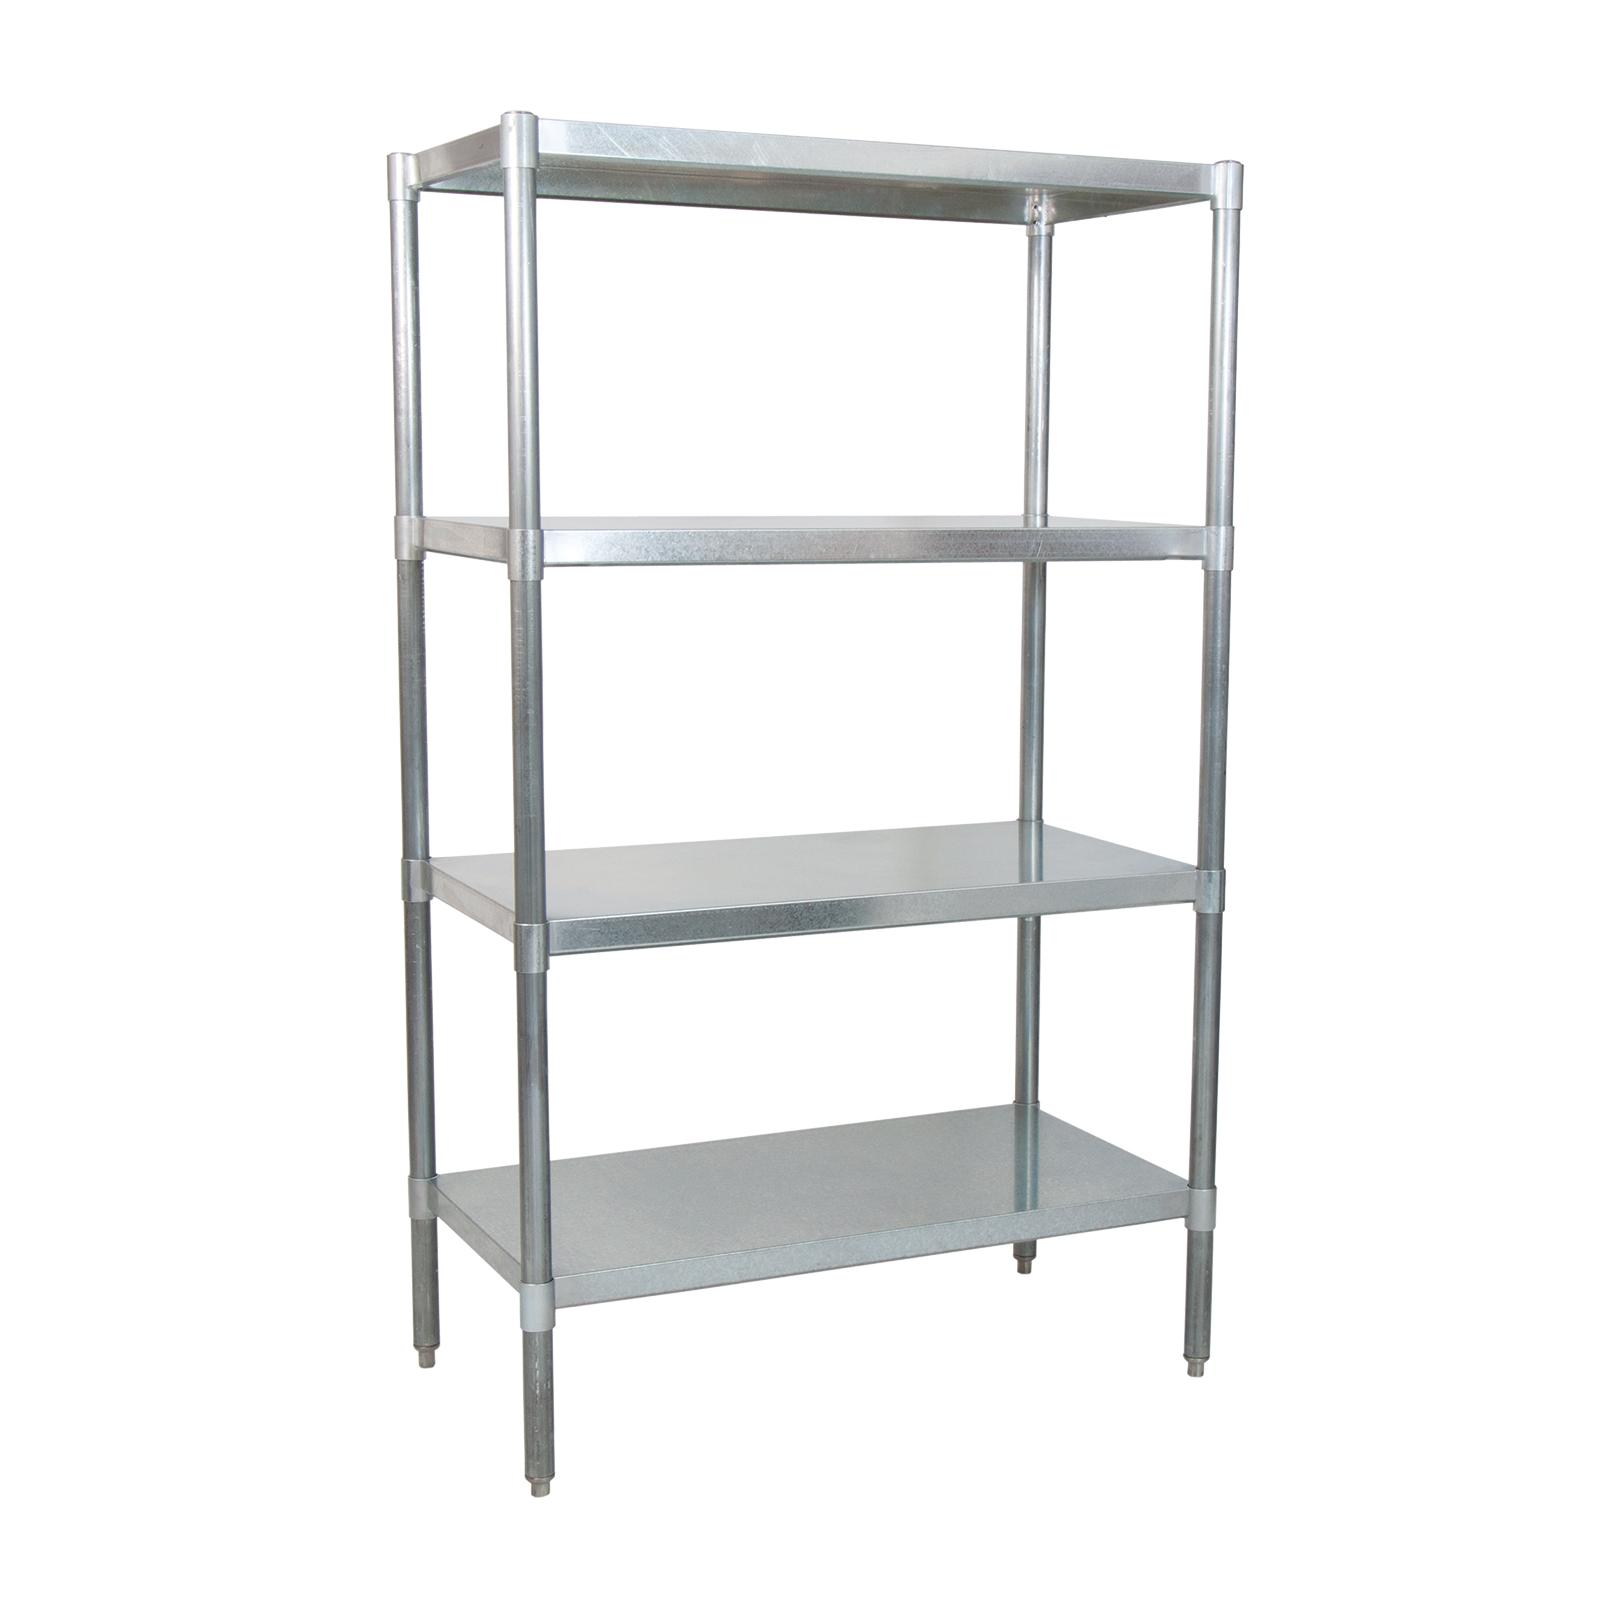 BK Resources SSU6-6724 shelving unit, solid flat